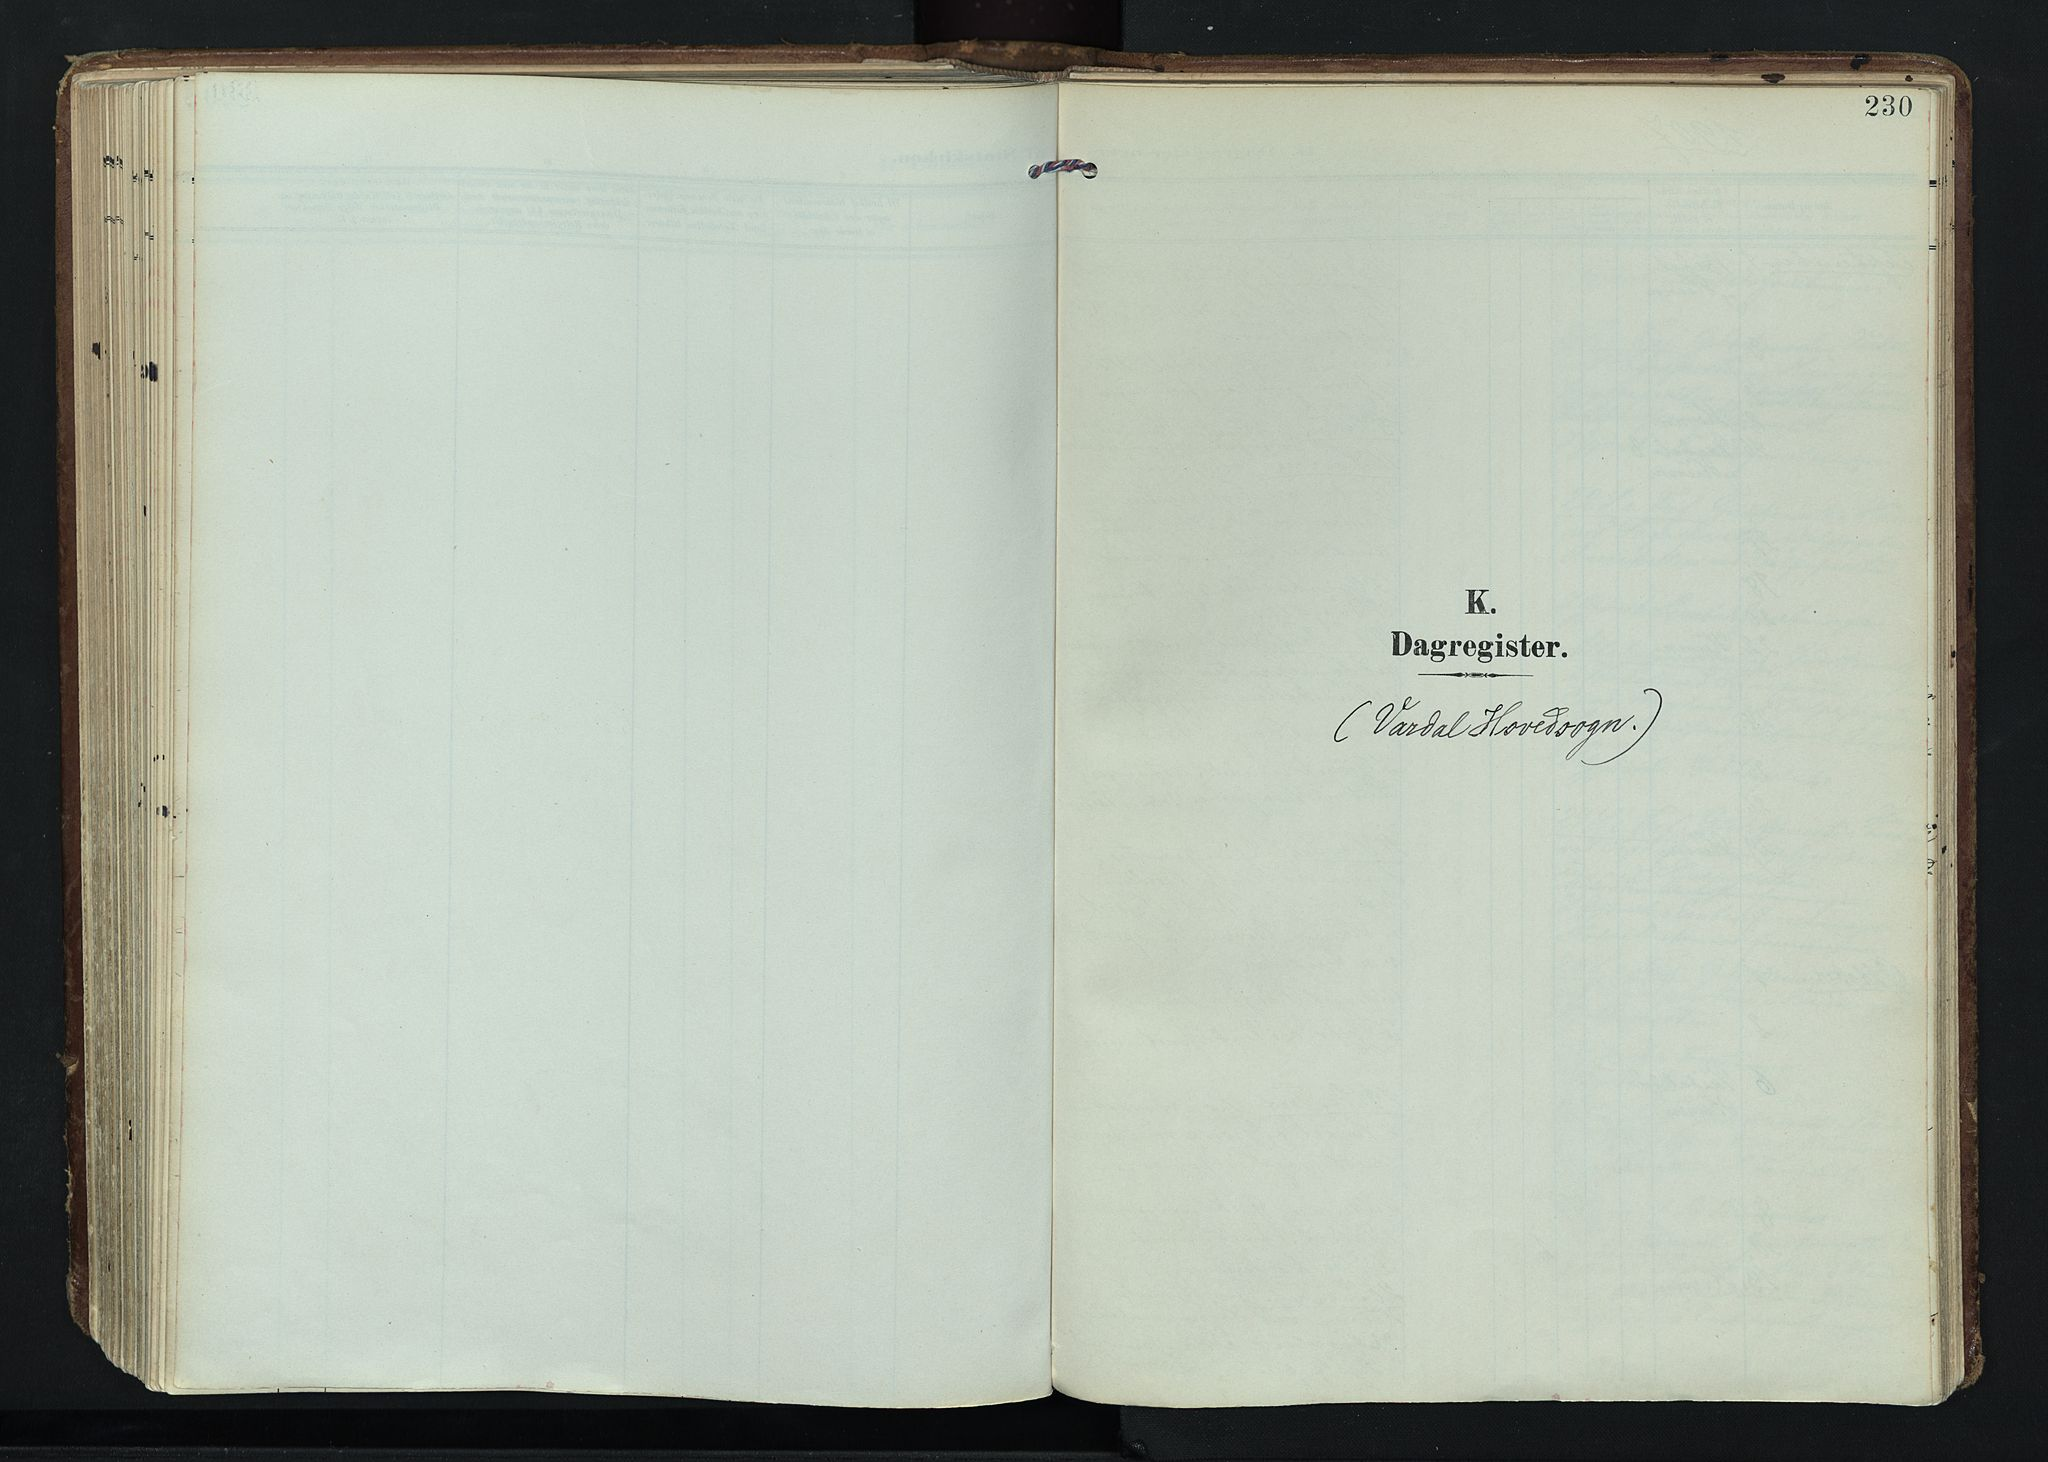 SAH, Vardal prestekontor, H/Ha/Haa/L0020: Ministerialbok nr. 20, 1907-1921, s. 230